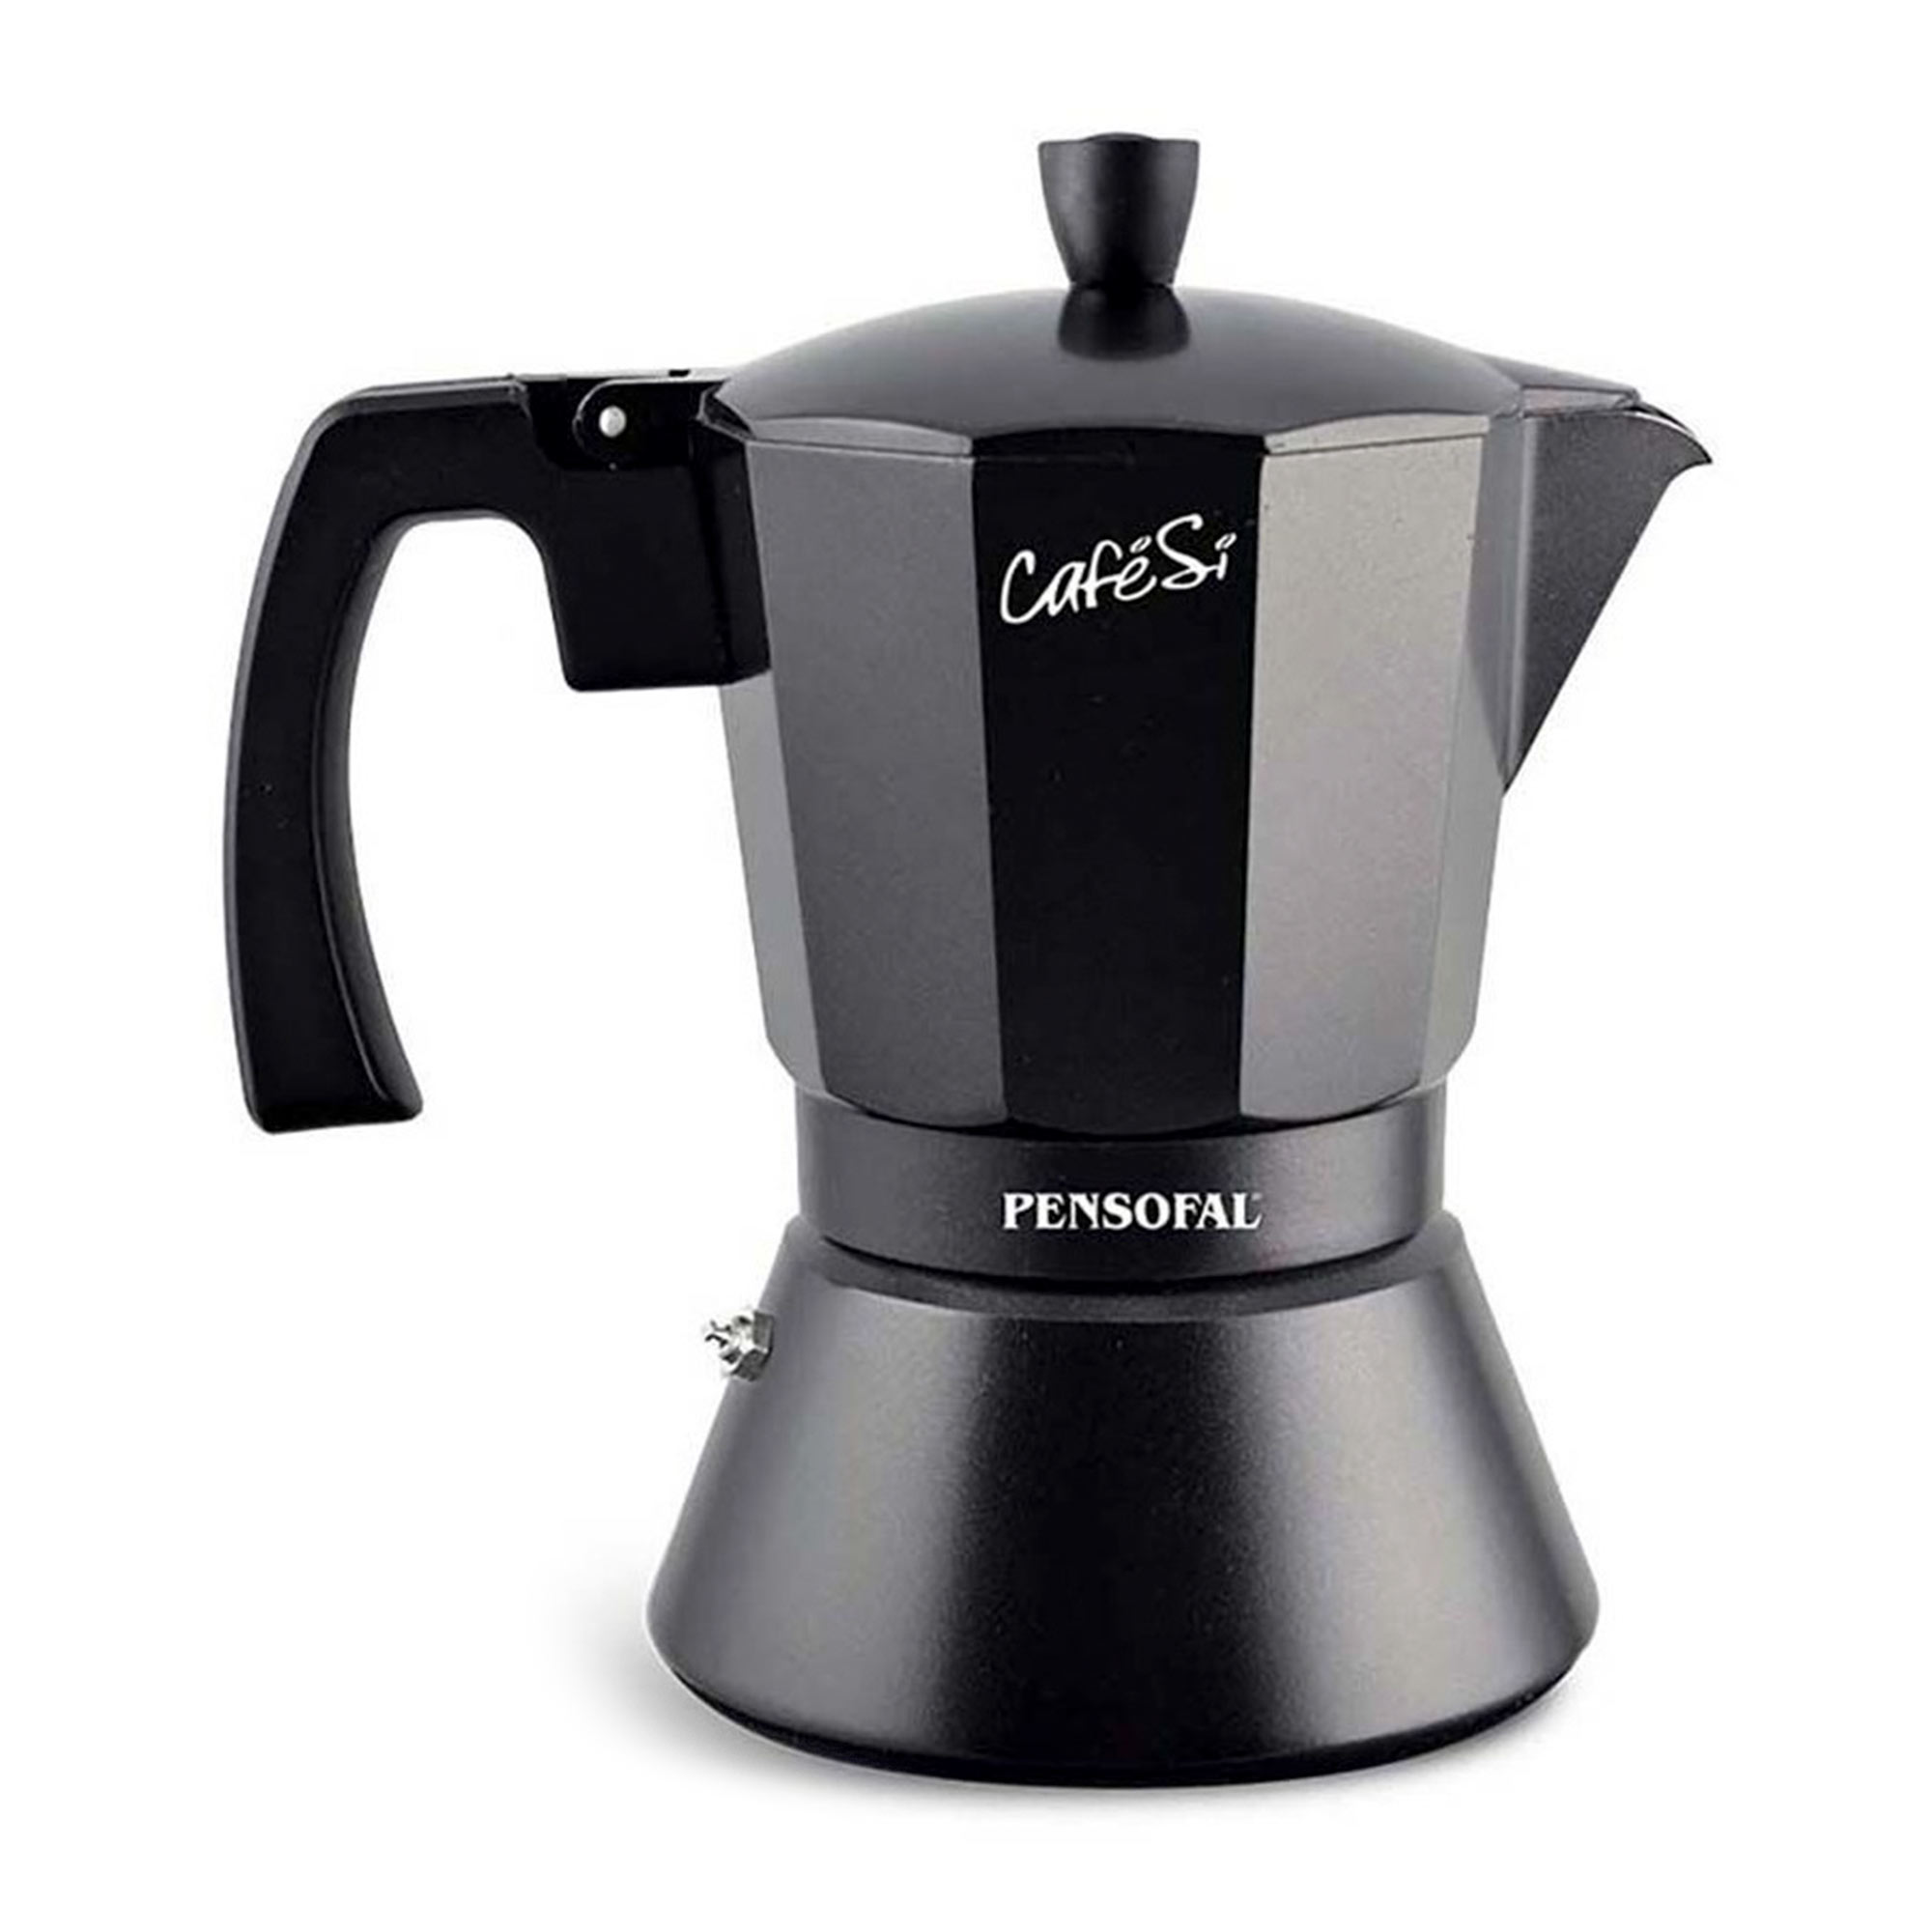 Фото - Гейзерная кофеварка Pensofal Cafesi Noir 470 мл гейзерная кофеварка на 6 чашек 350 мл pensofal